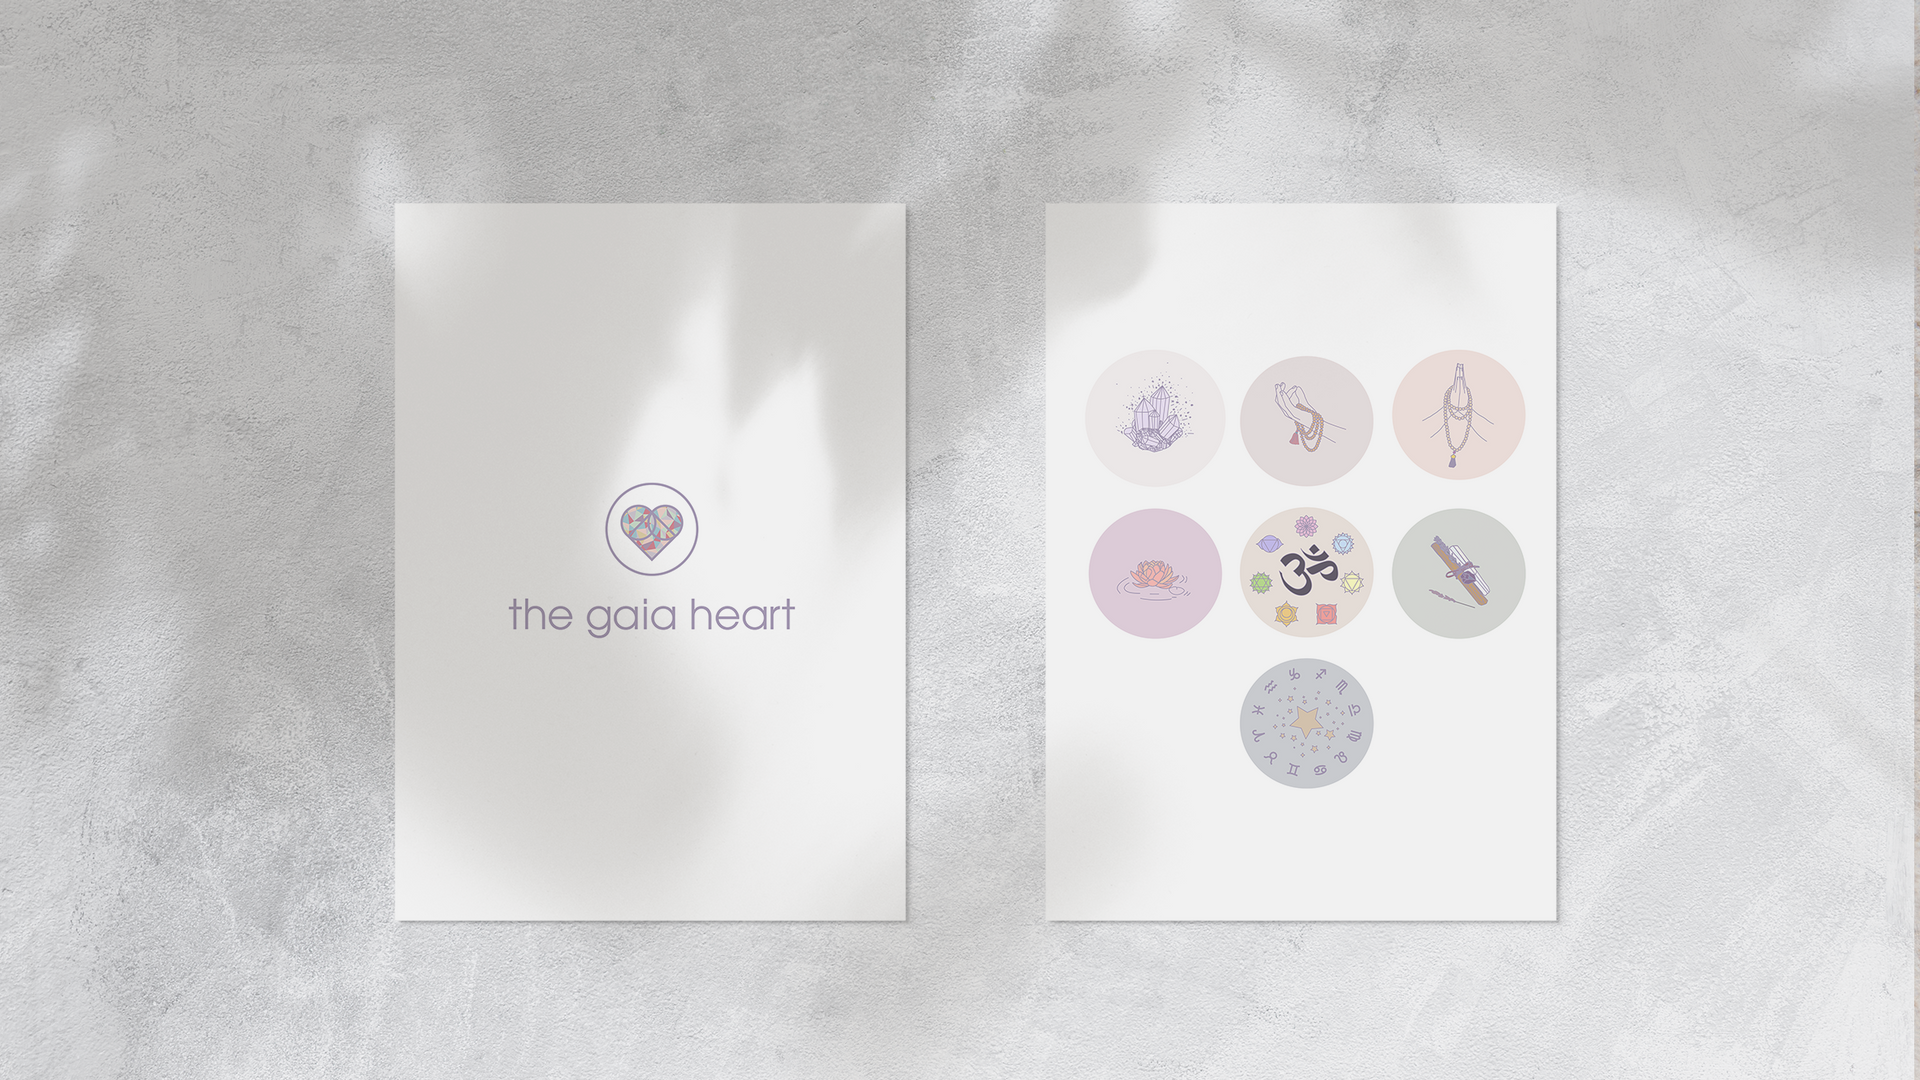 Gaia heart icons